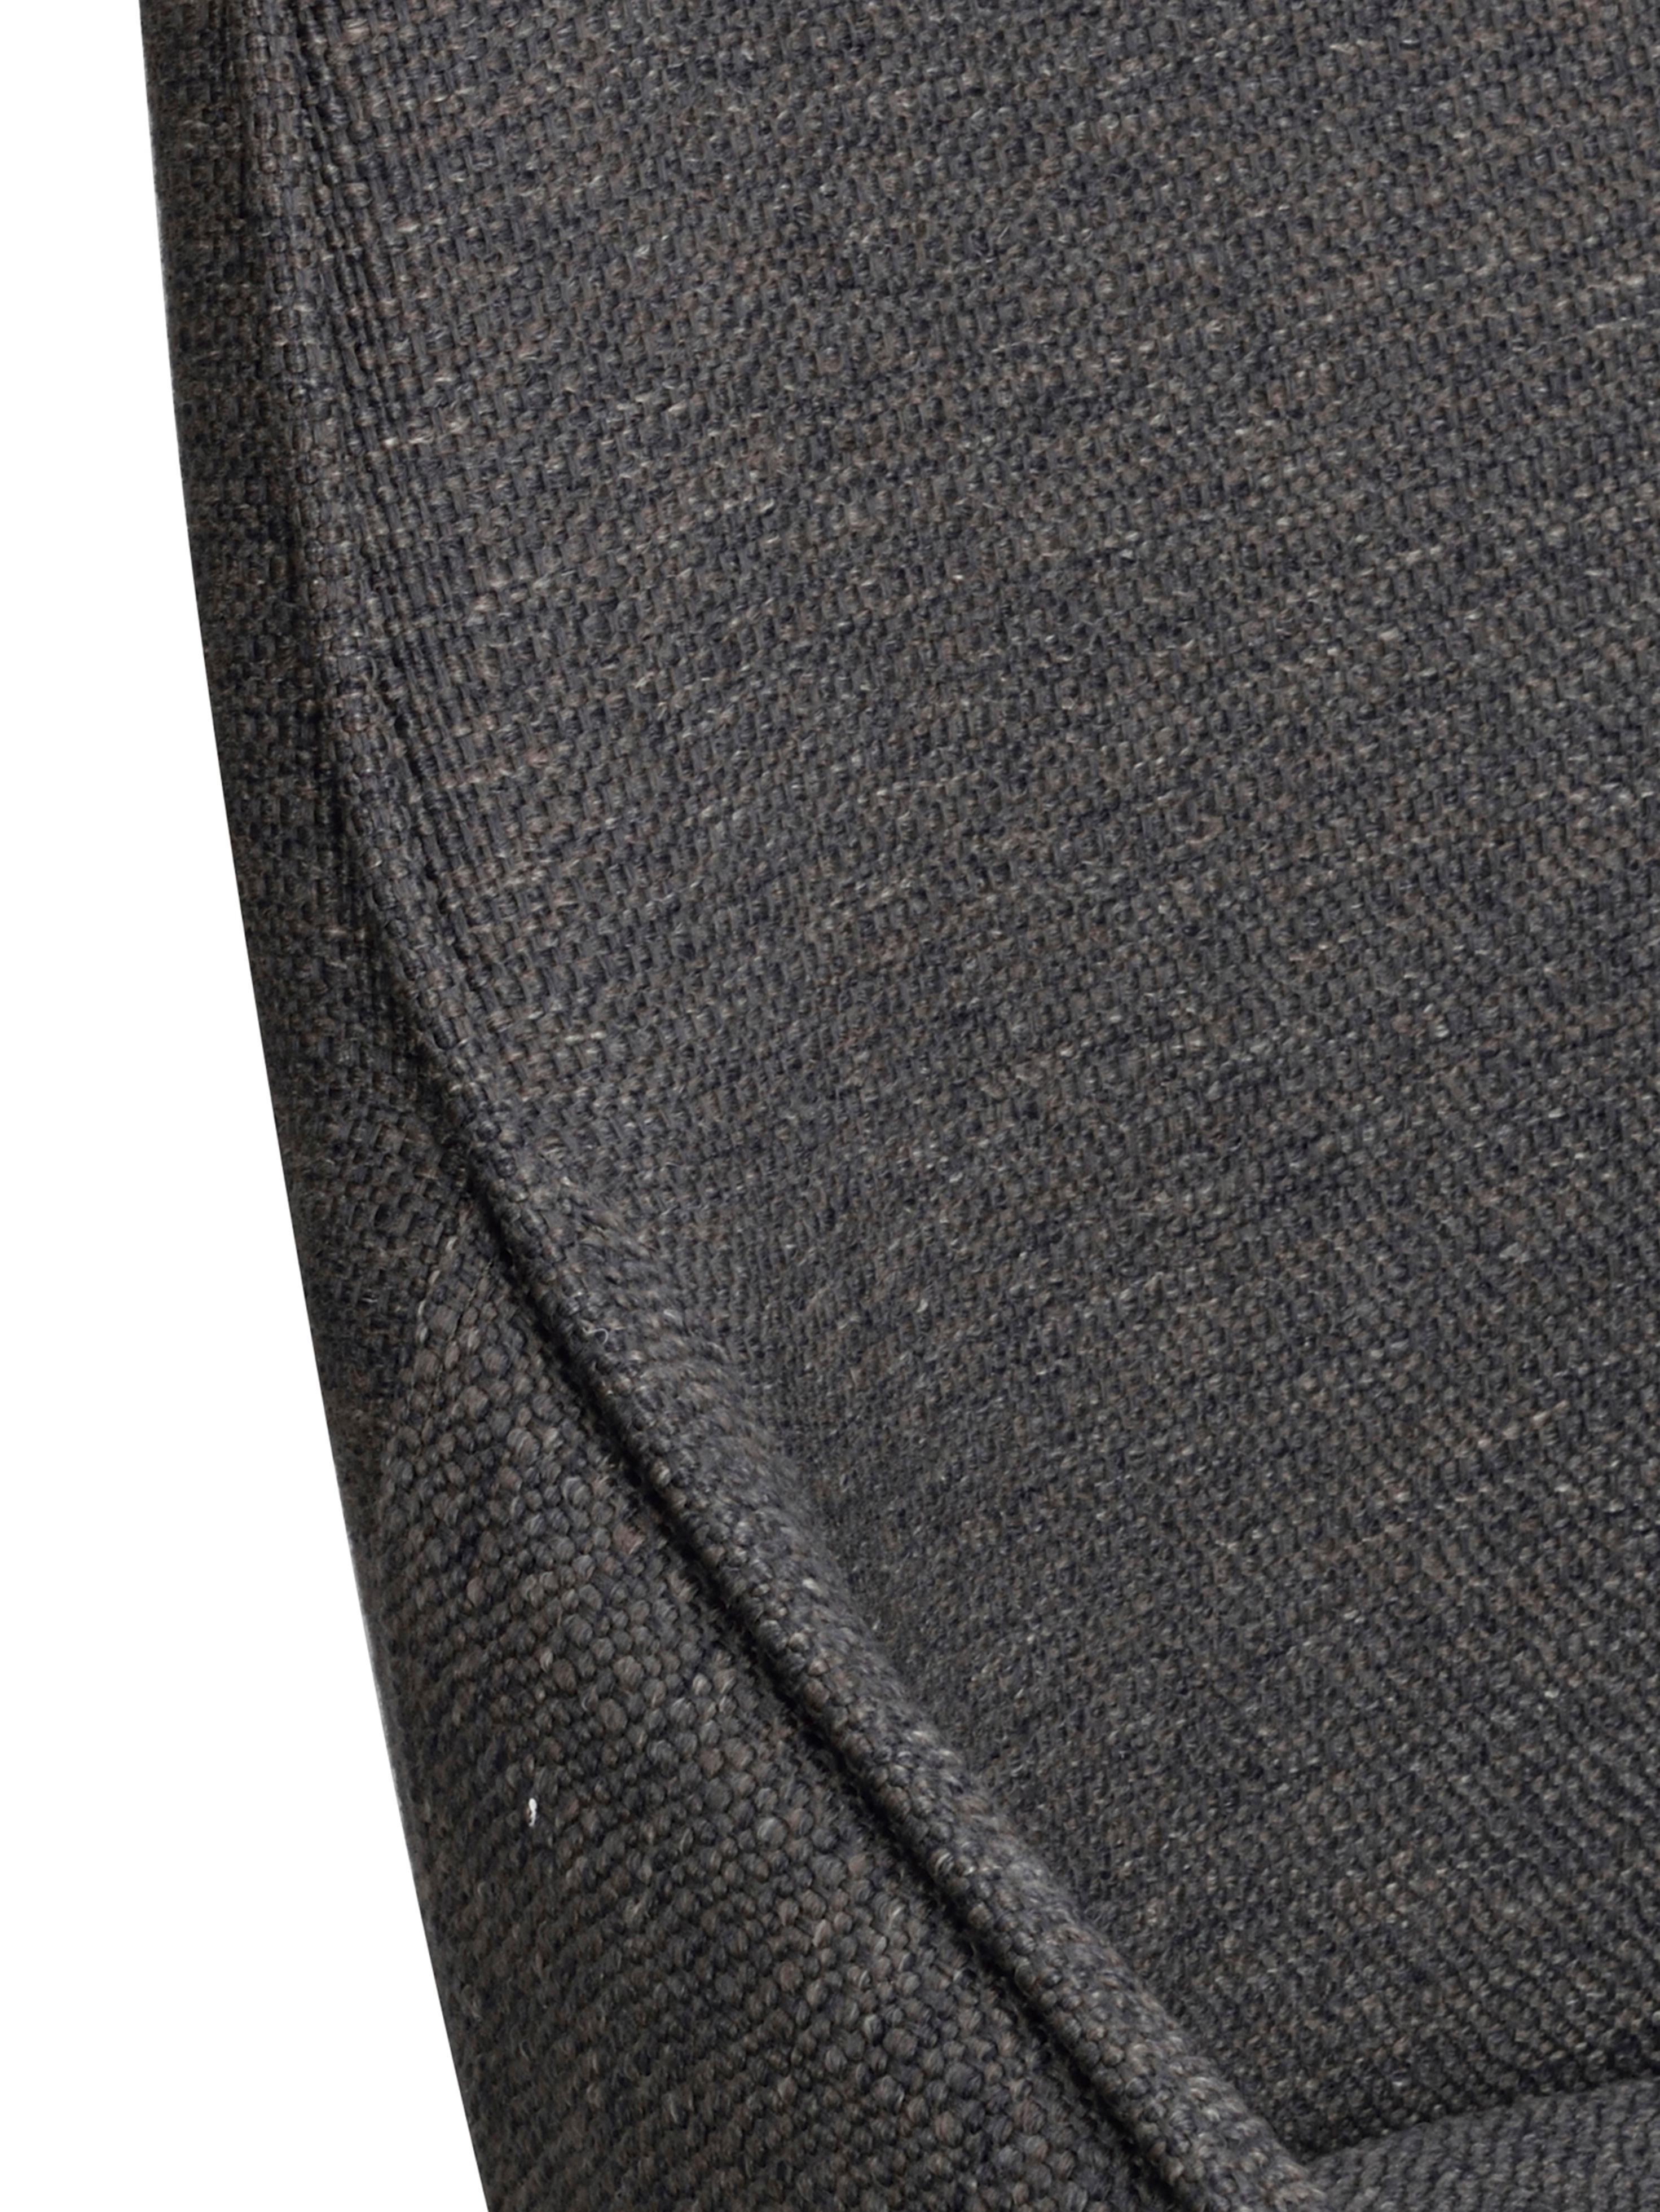 Gepolsteter Drehstuhl Alison, Bezug: Polyester 50.000 Scheuert, Beine: Metall, pulverbeschichtet, Webstoff Dunkelgrau, B 51 x T 57 cm